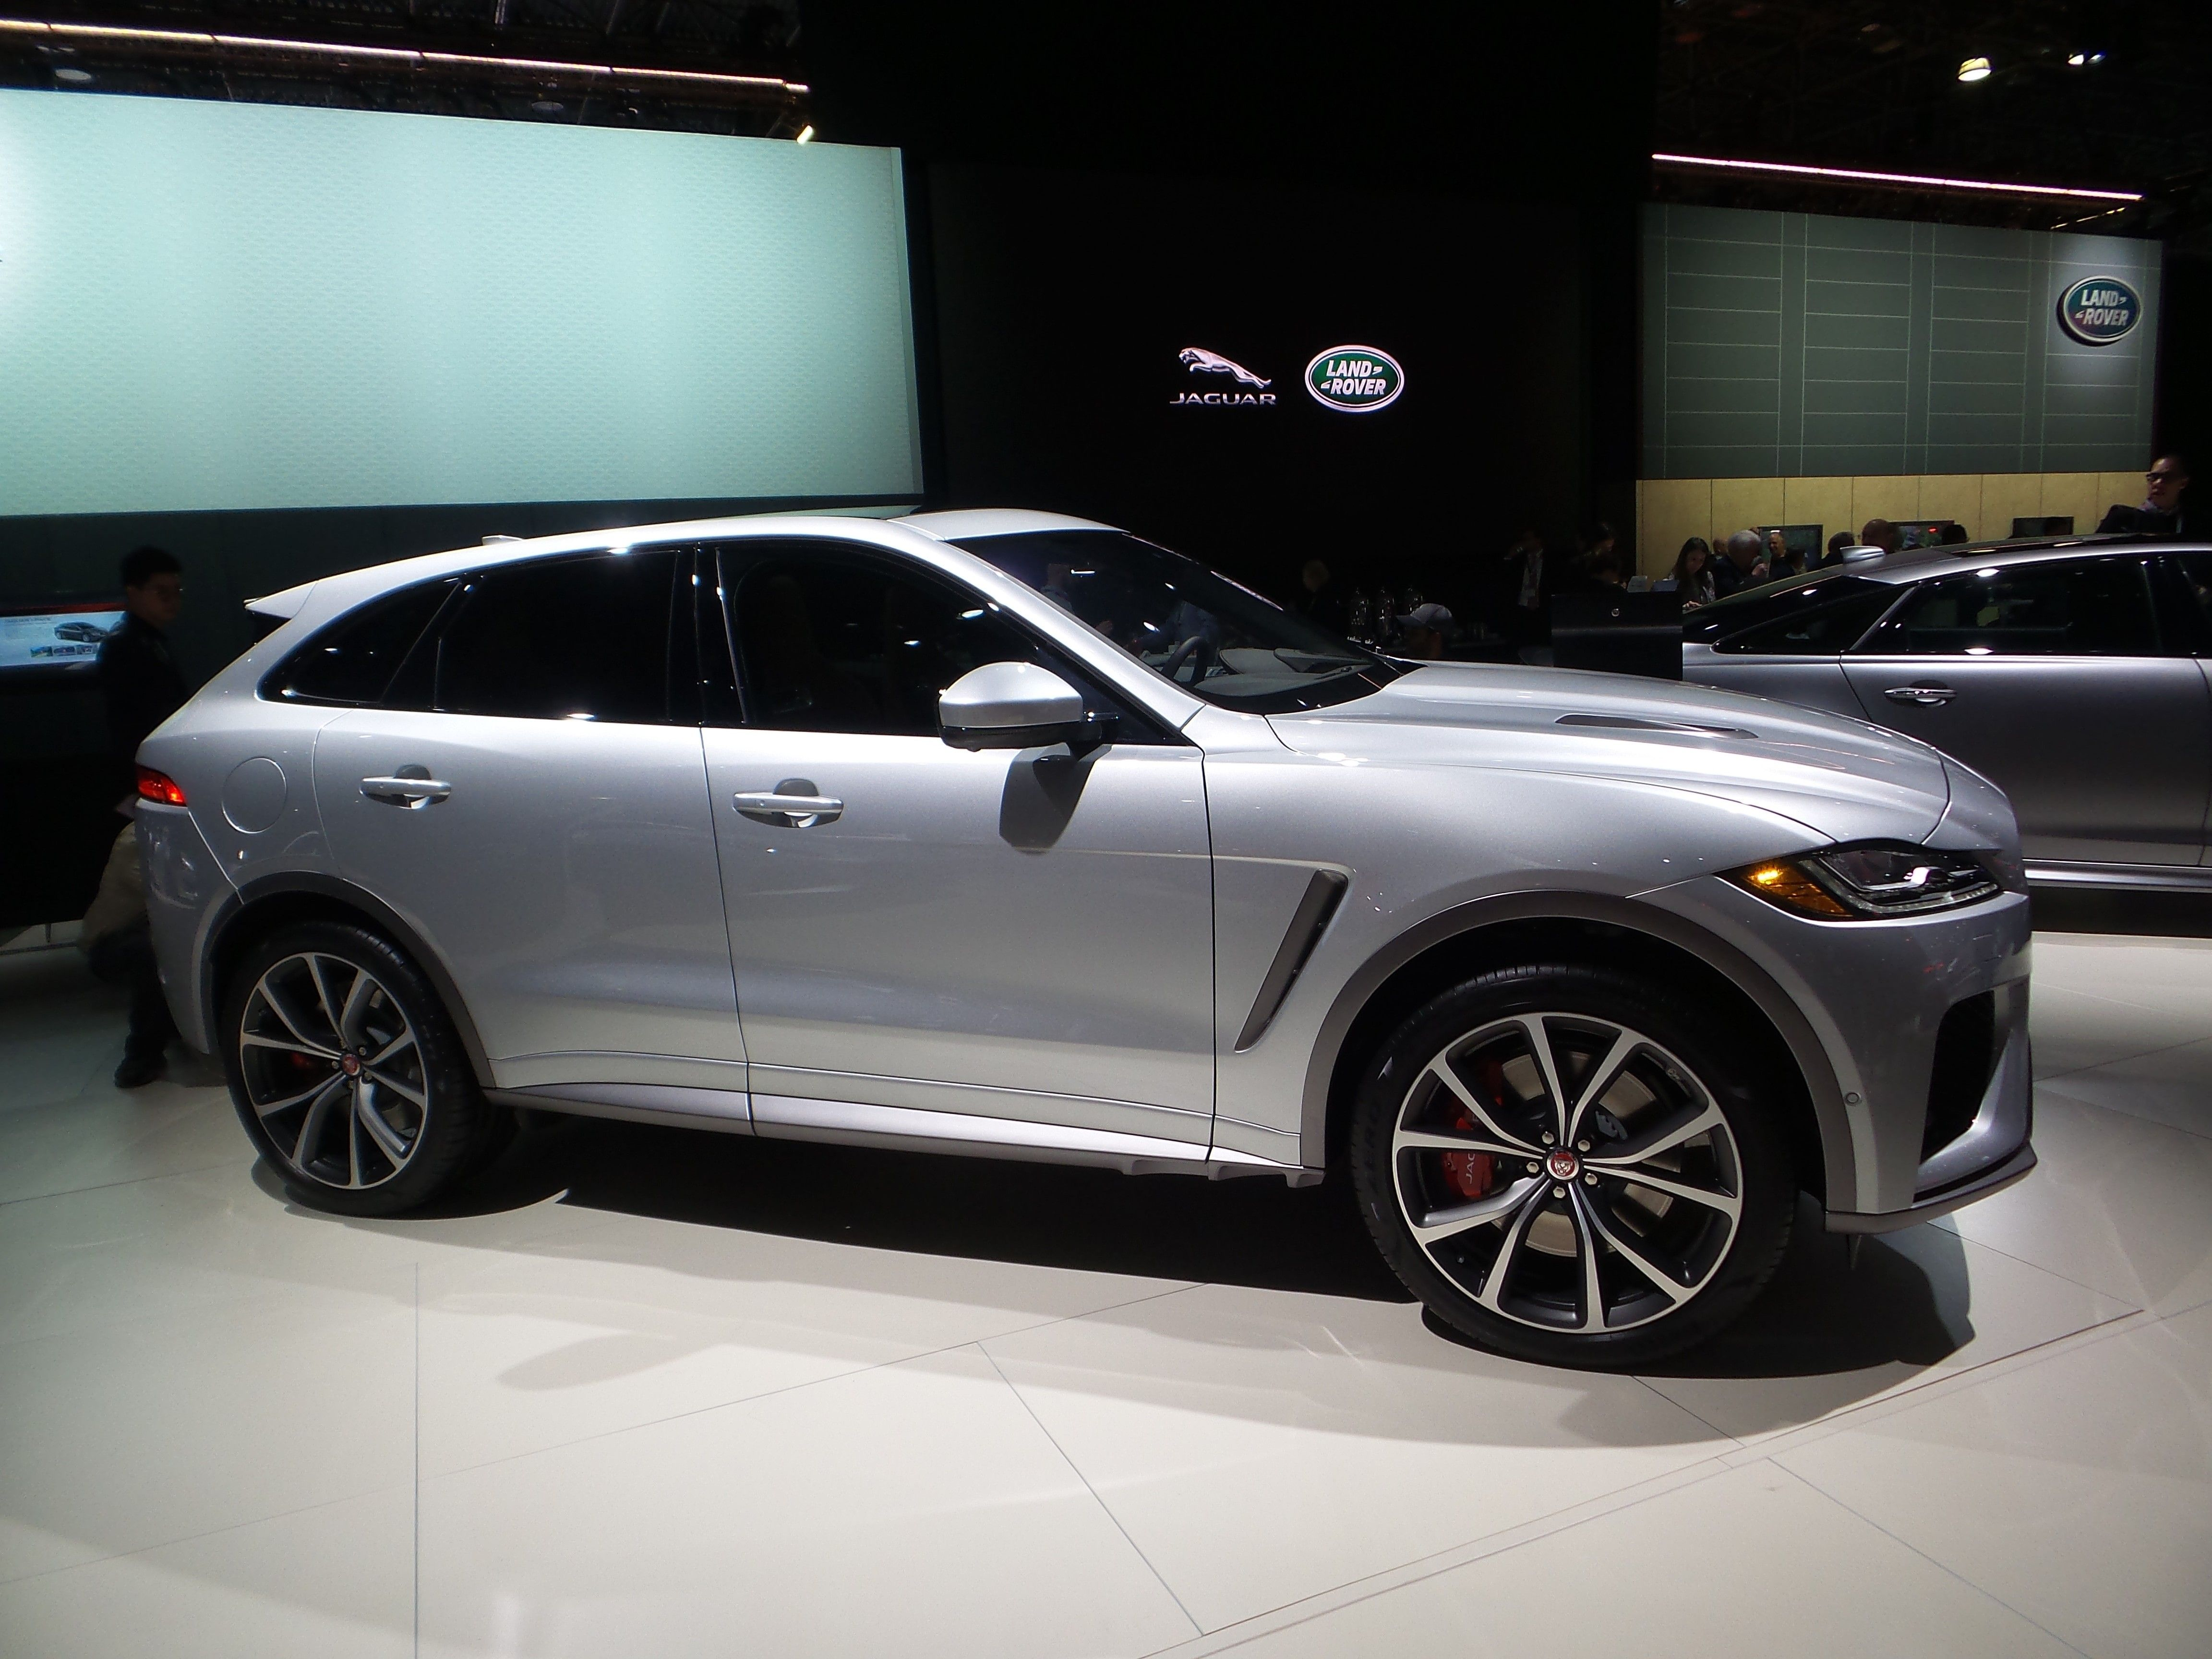 2019 Jaguar F Pace Svr Price Redesign Price And Review Jaguar Jaguar Suv Car